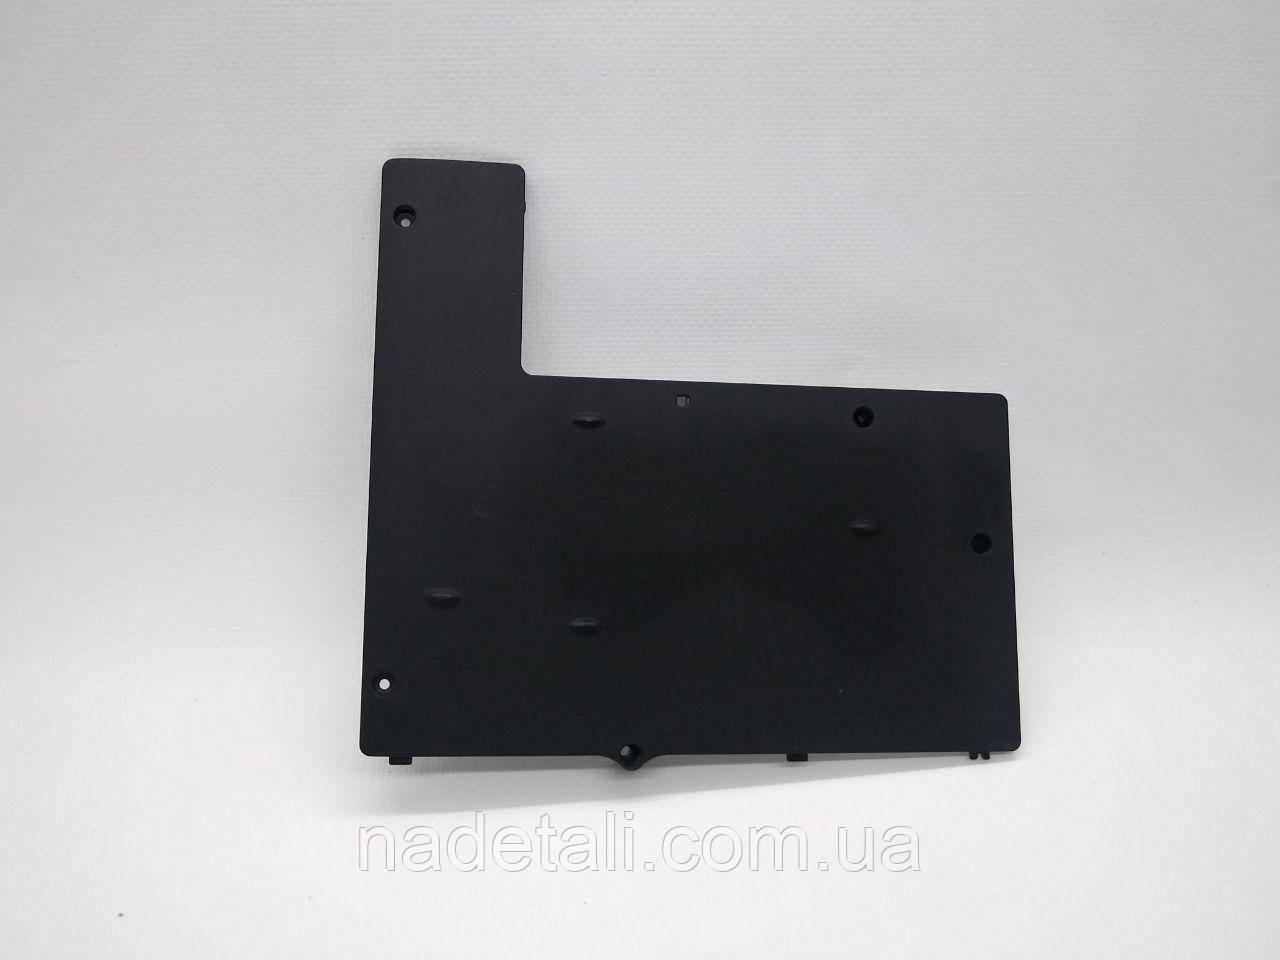 Сервисная крышка Acer Aspire 5536/5236 WIS604CG0700209